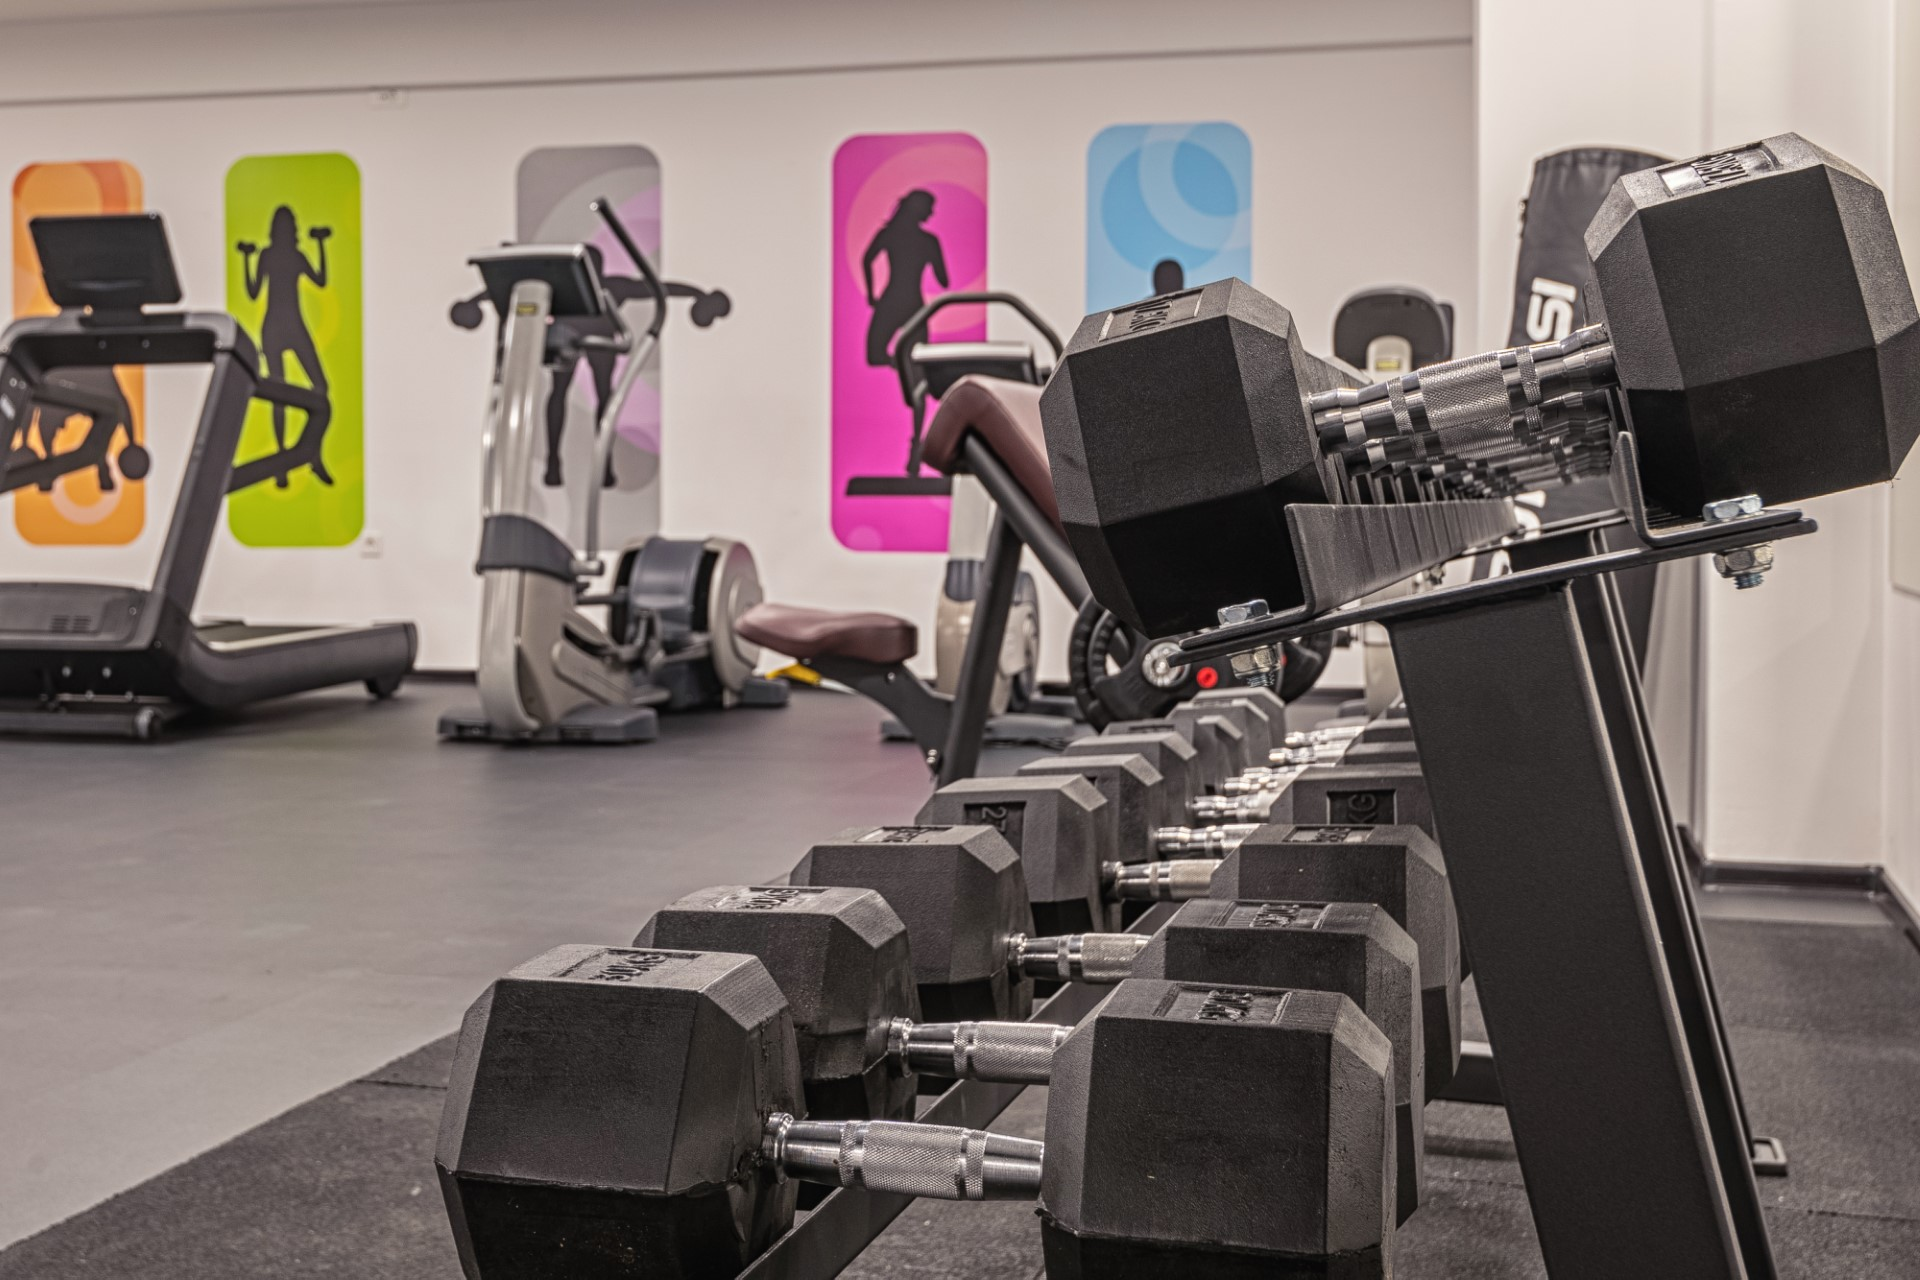 Marea hotel Fitness dvorana fav (1)